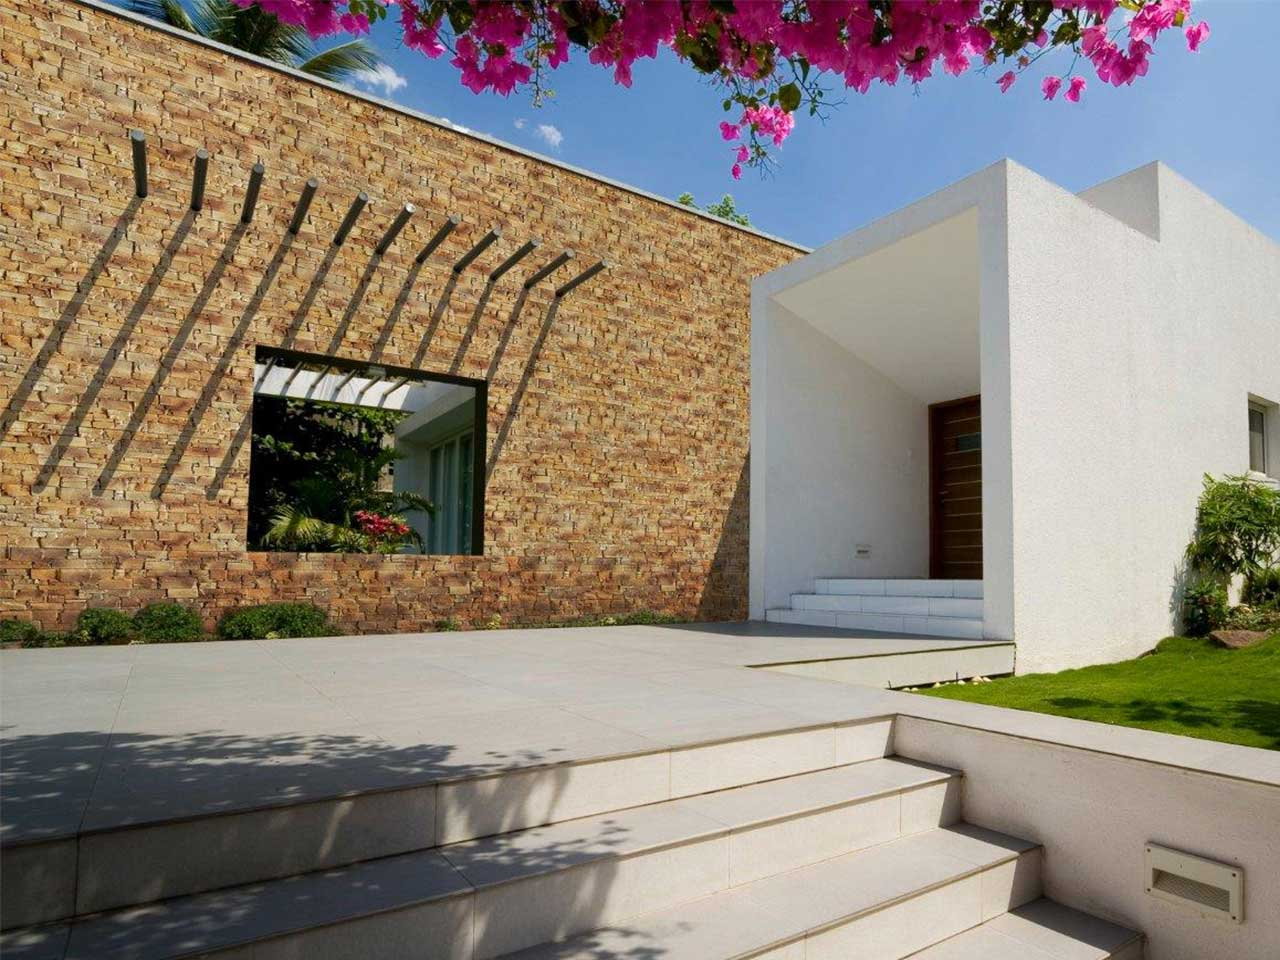 Facciate case moderne la villa vacanze in affitto isola for Facciate case moderne